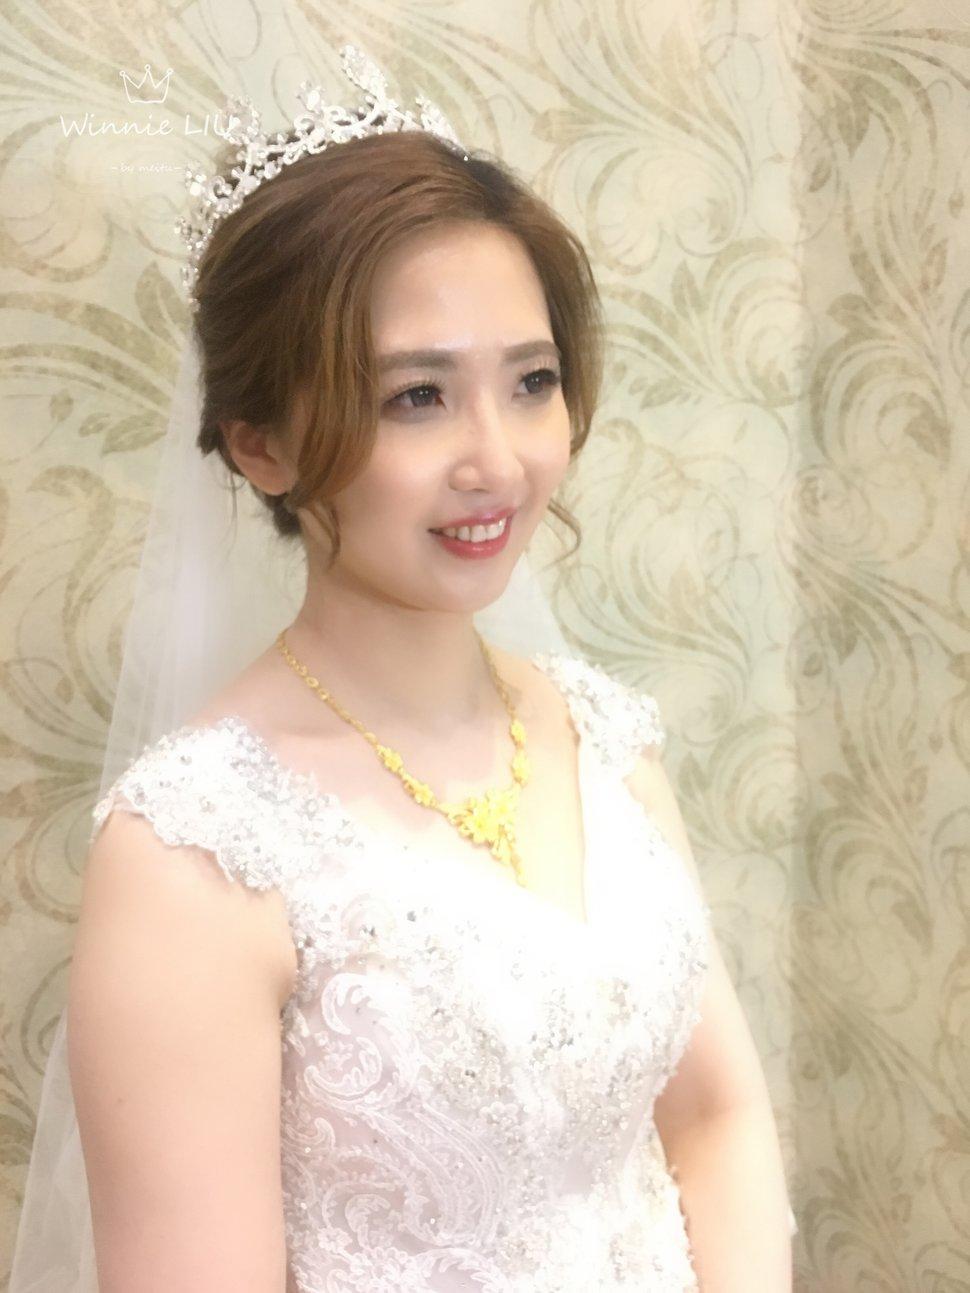 D7A30425-C3E6-48B3-8245-5A221BBF8904 - Winnie Liu白色時尚城堡《結婚吧》